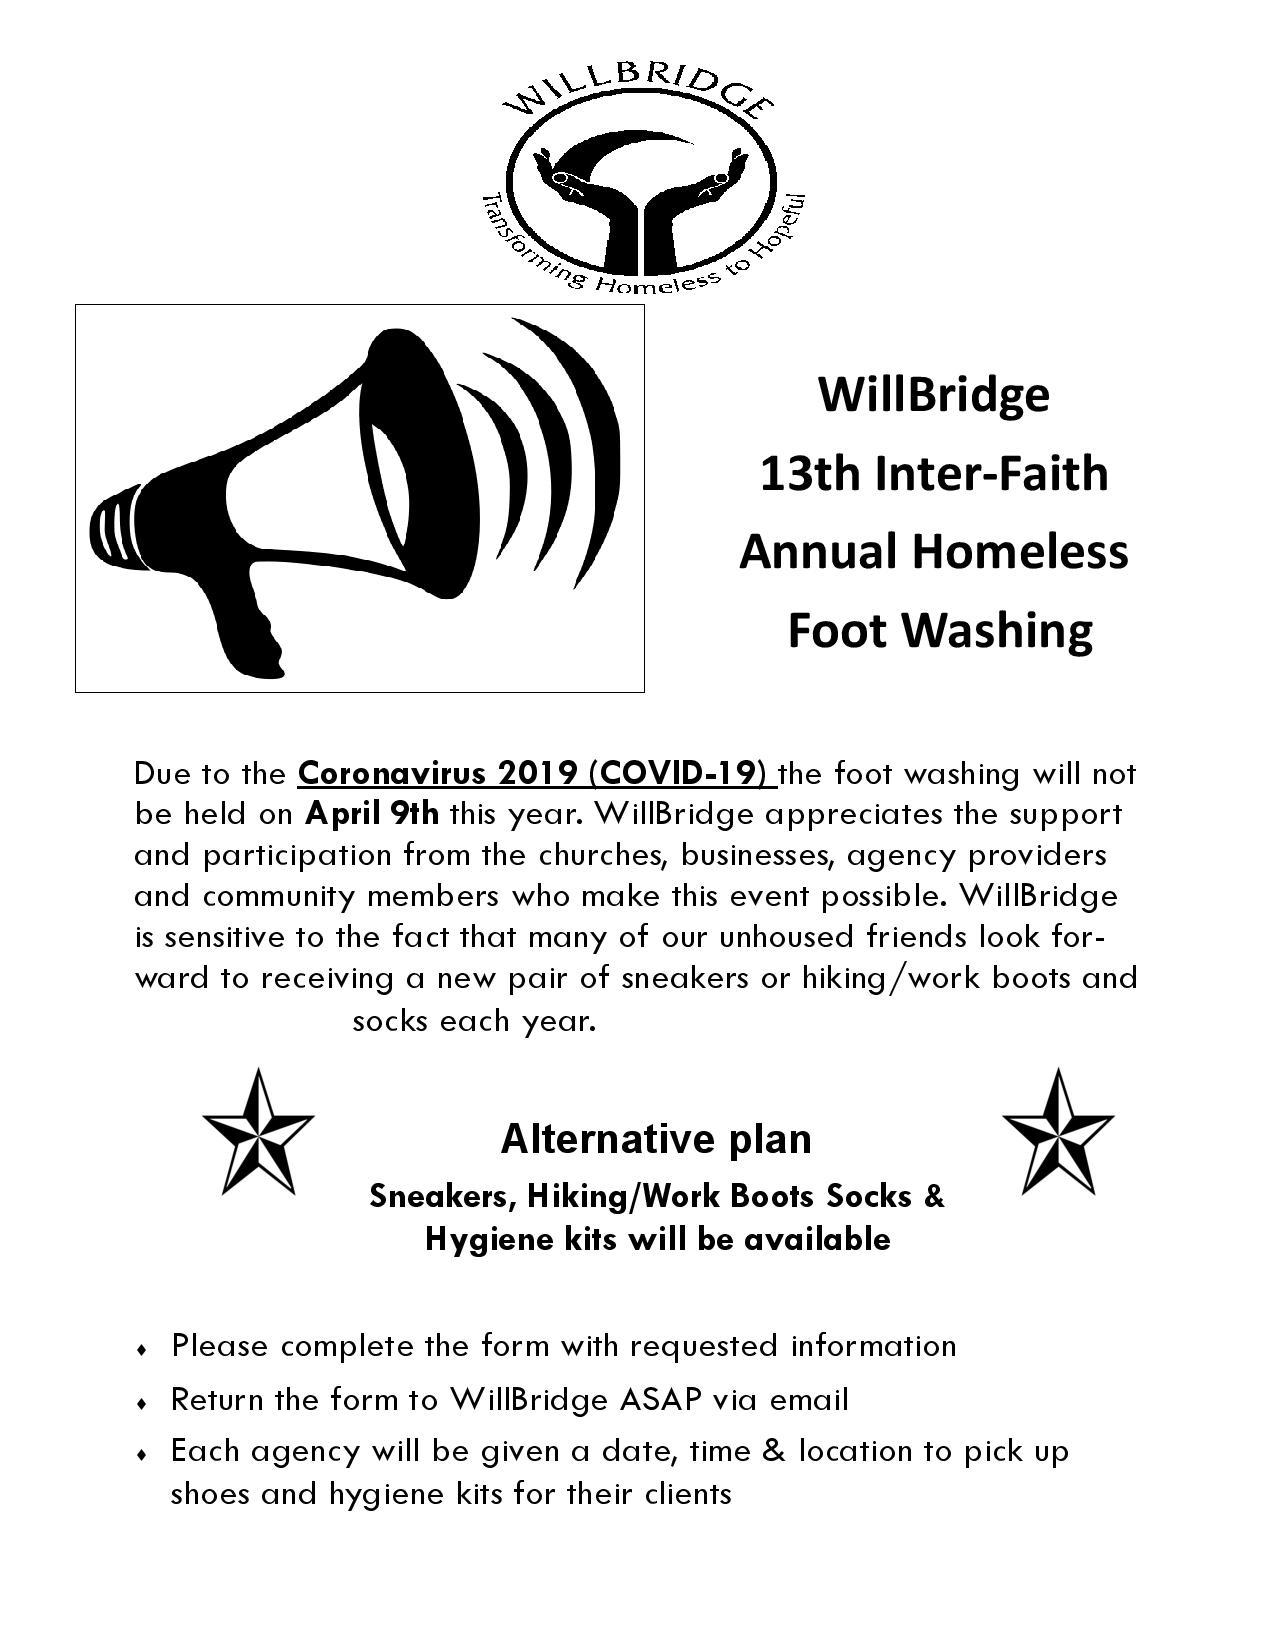 Willbridge 13th Inter-Faith Annual Homeless Foot Washing